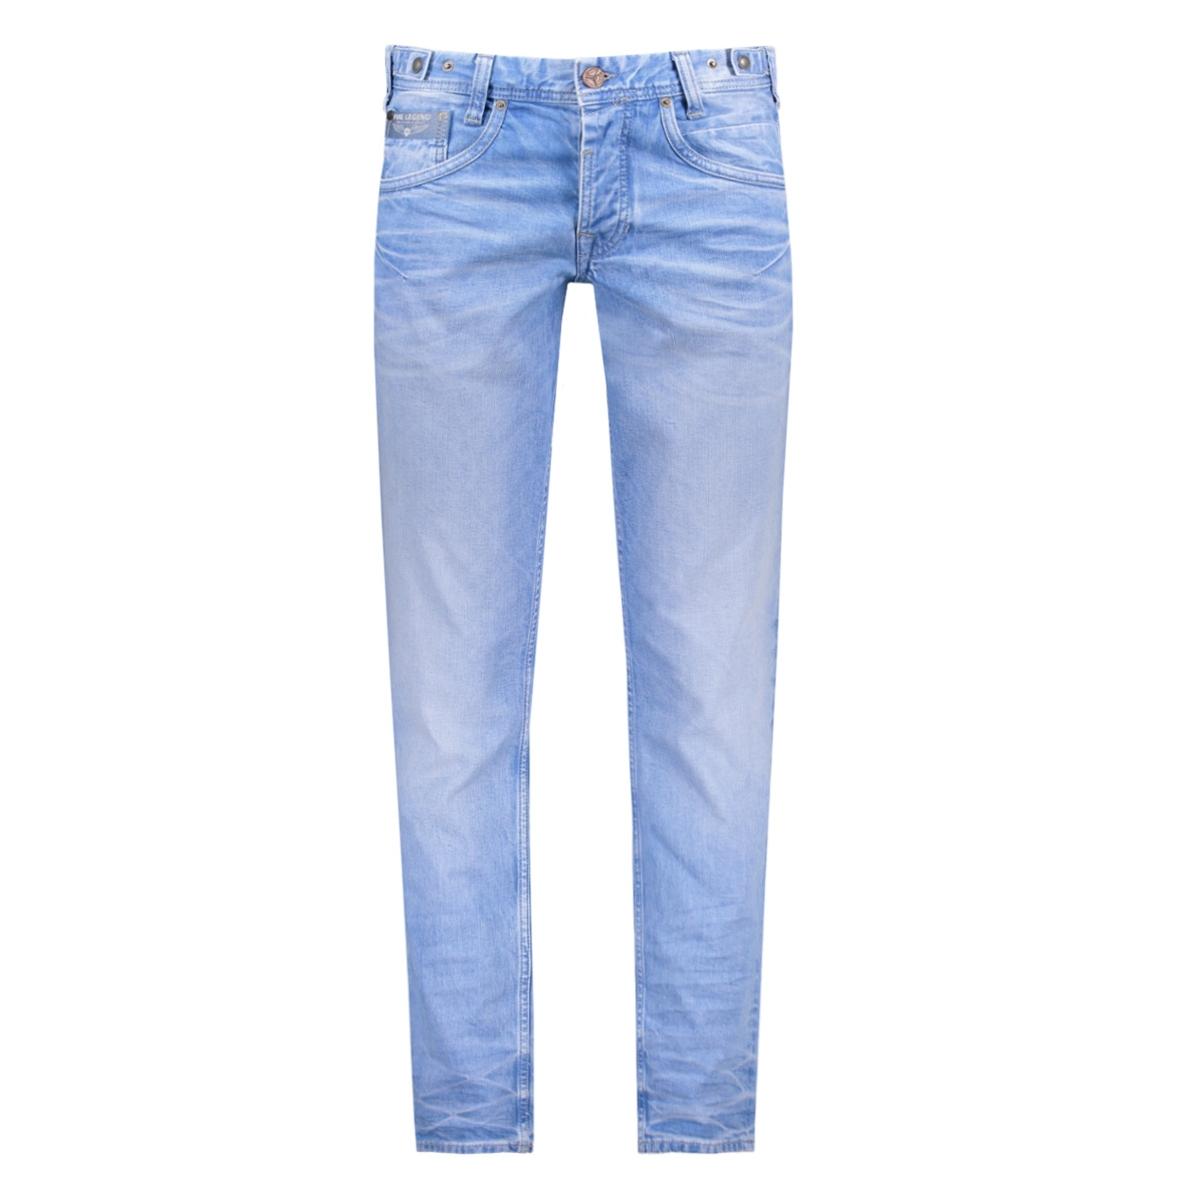 skyhawk ptr170-ibb pme legend jeans ibb